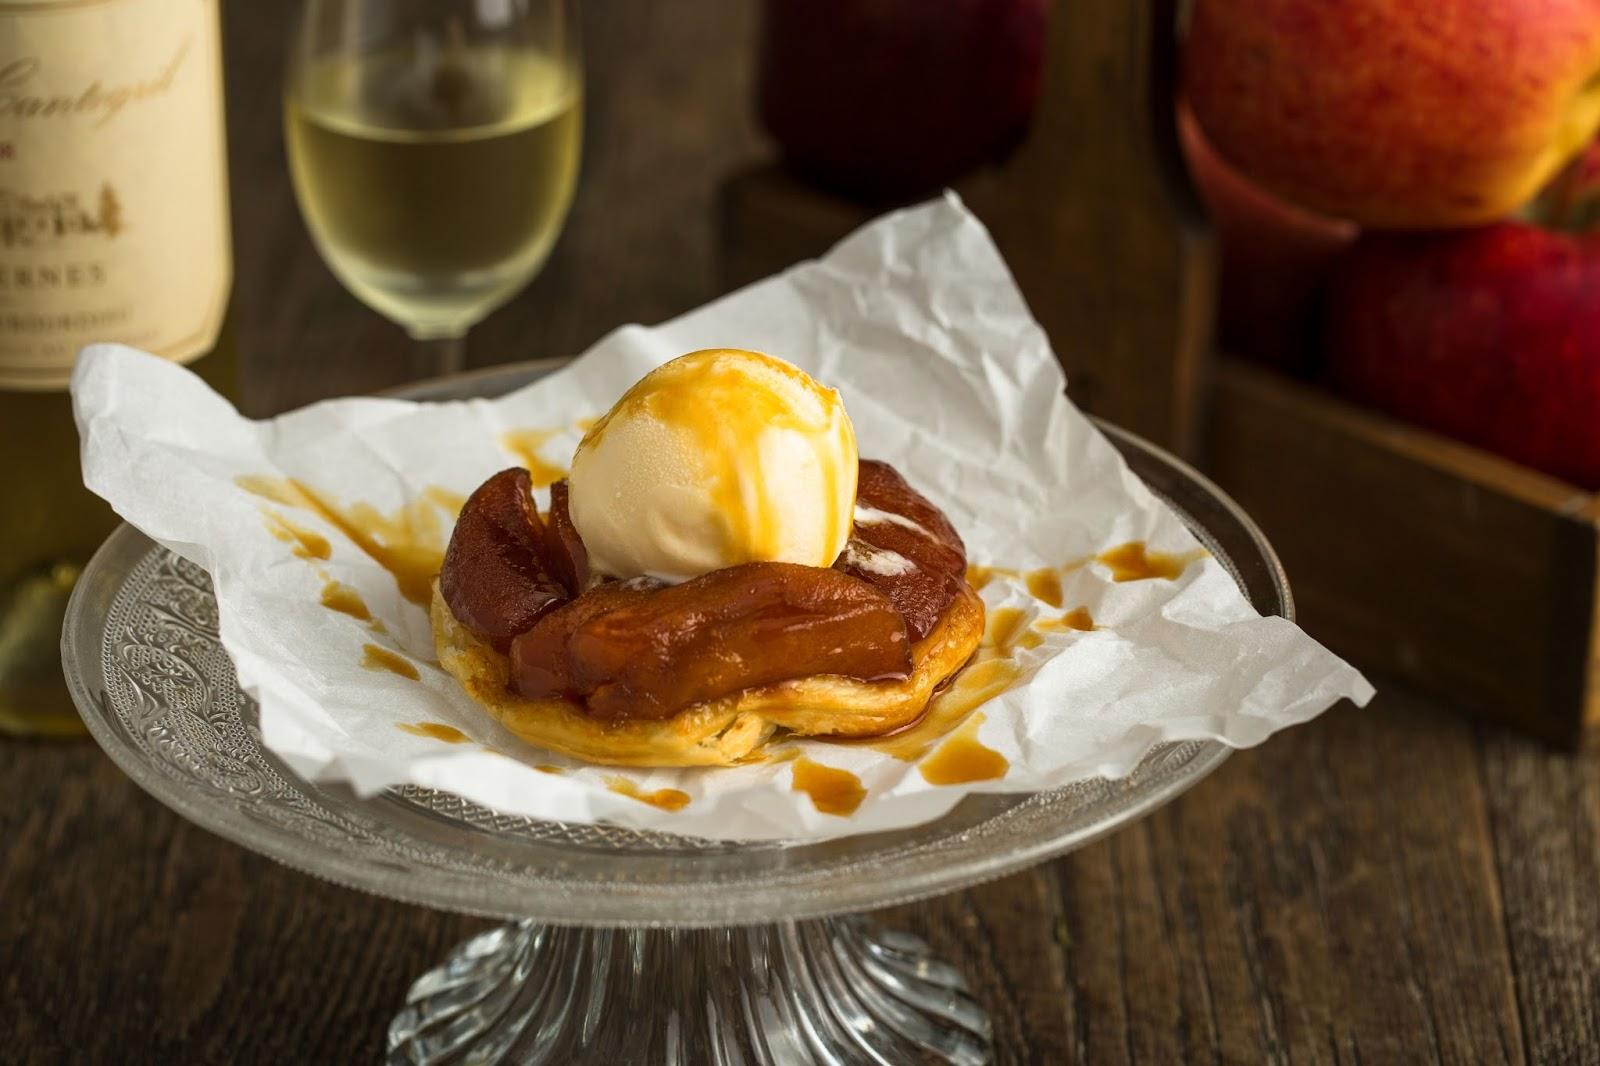 steak frites, apple tart, Apple Tarte Tatin, signature desserts, vanilla ice cream, caramel, pastry, puff pastry, deserts, French dessert, French